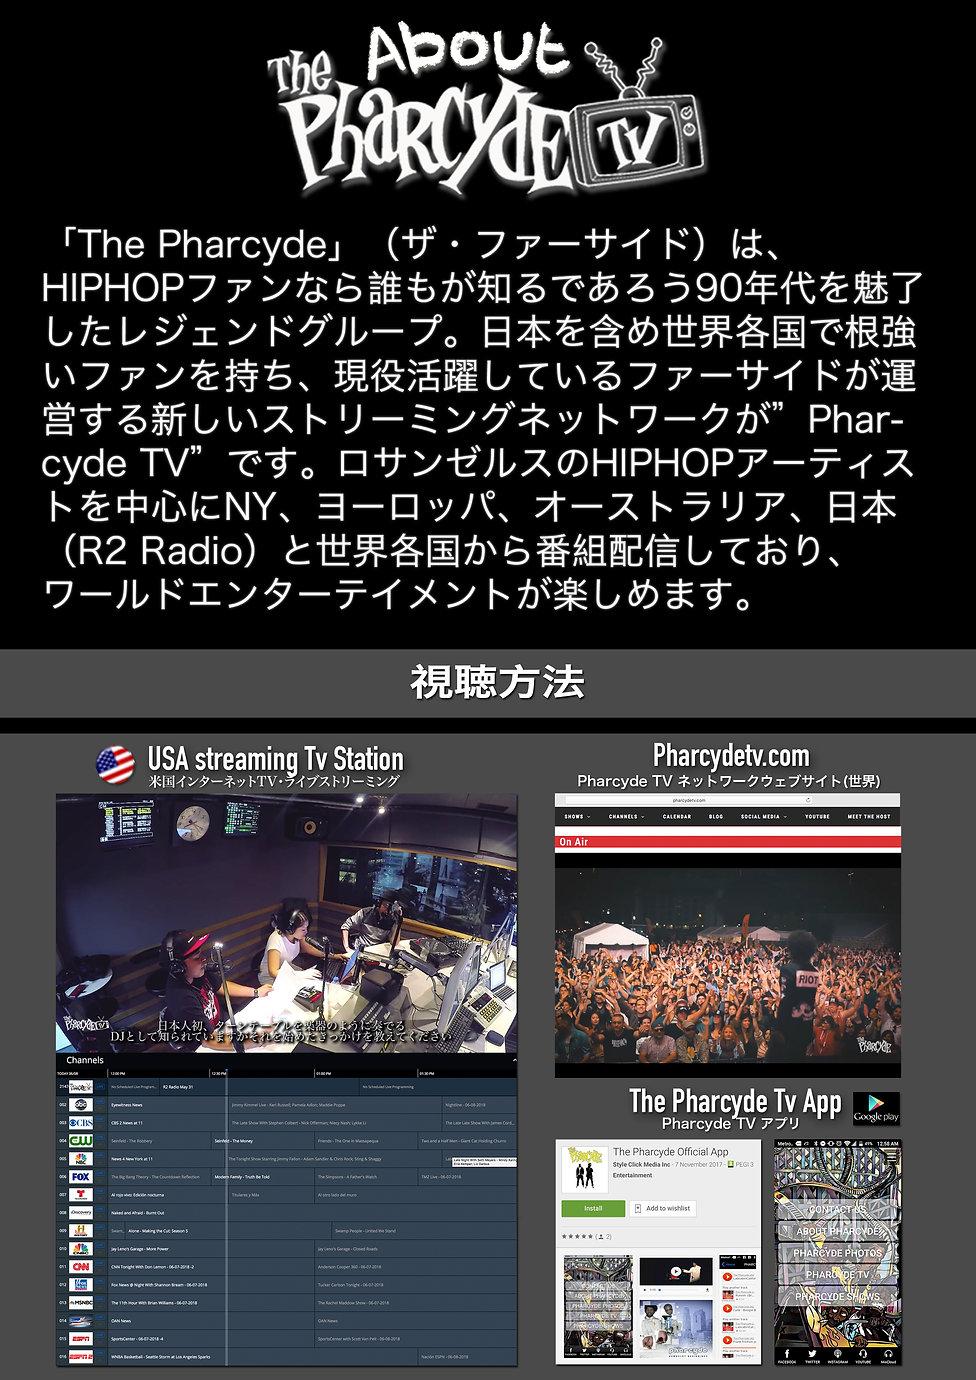 2-Ab Pharcydetv-2_update.jpg